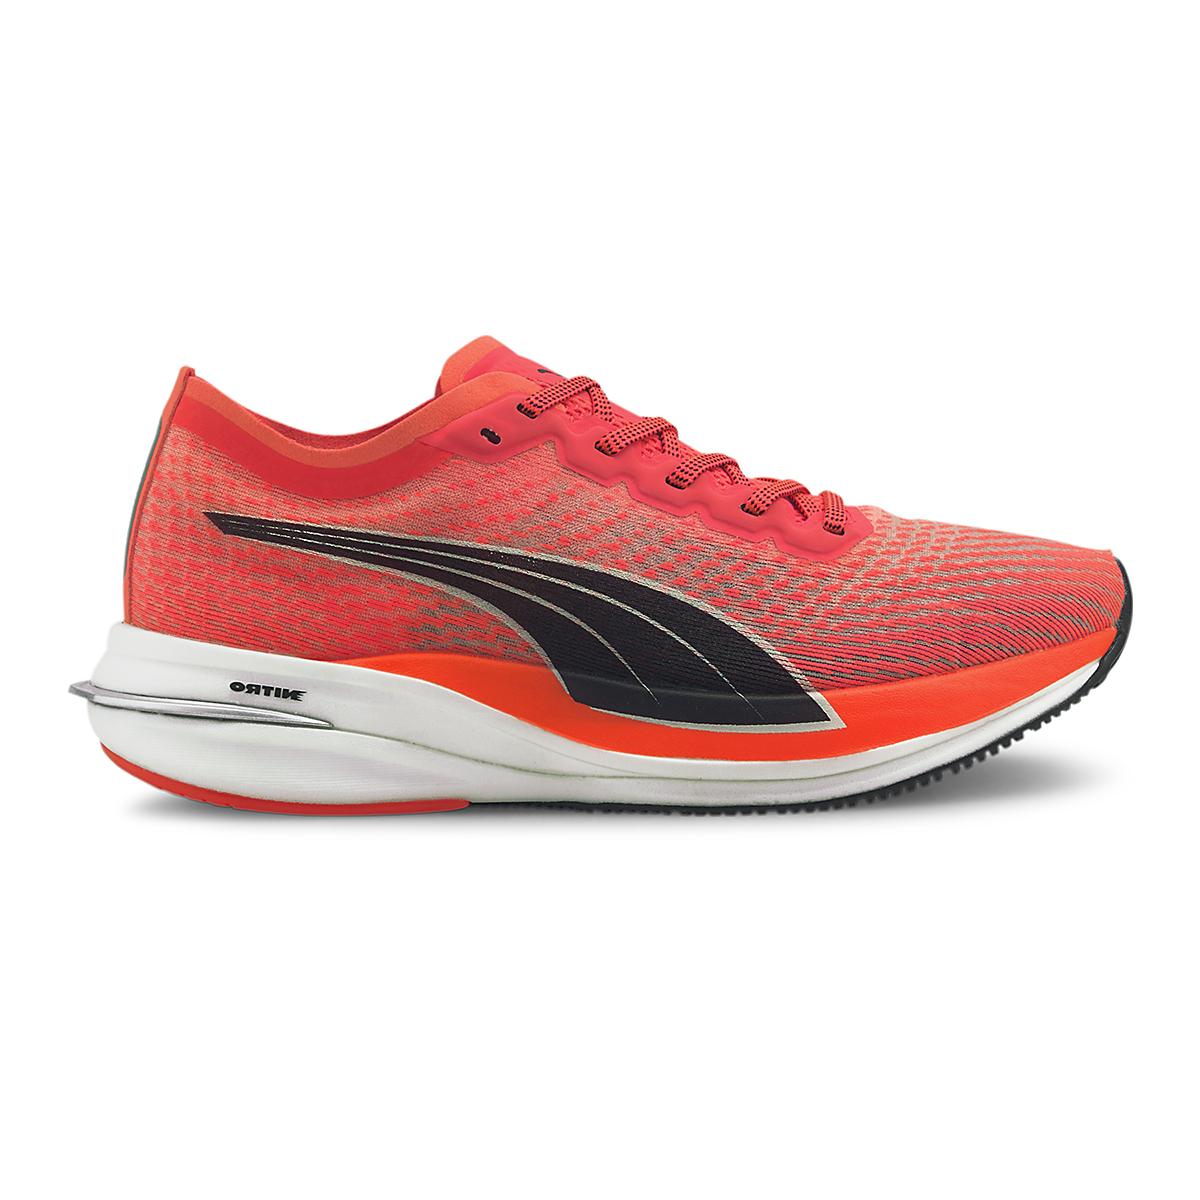 Women's Puma Deviate Nitro Running Shoe - Color: Lava Blast-Puma Black - Size: 5.5 - Width: Regular, Lava Blast-Puma Black, large, image 1